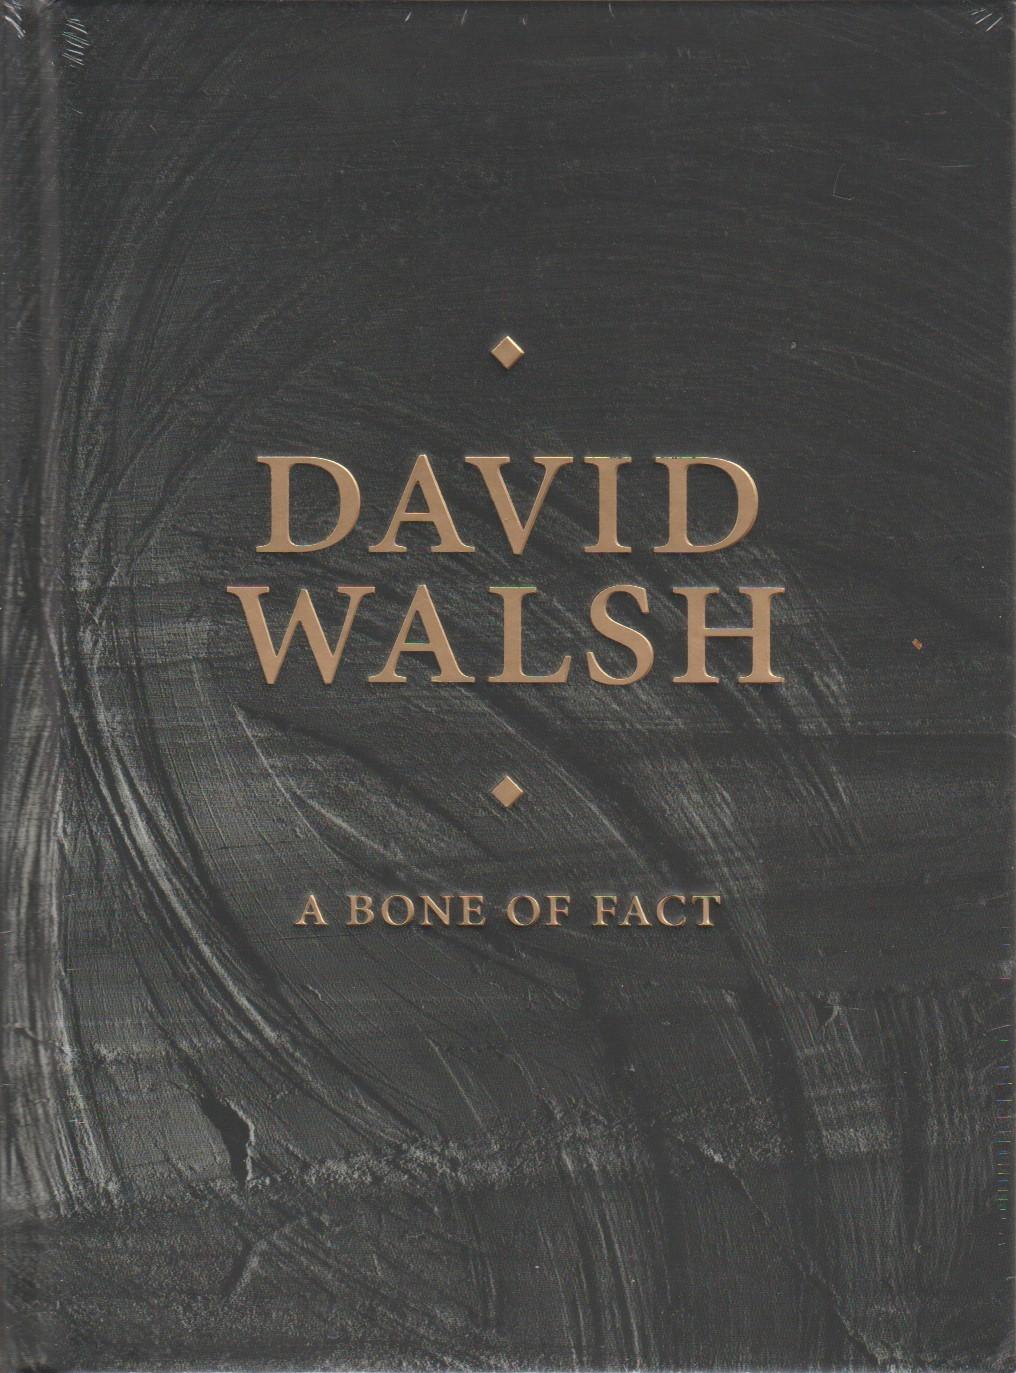 A Bone of Fact  - David Walsh autobiography